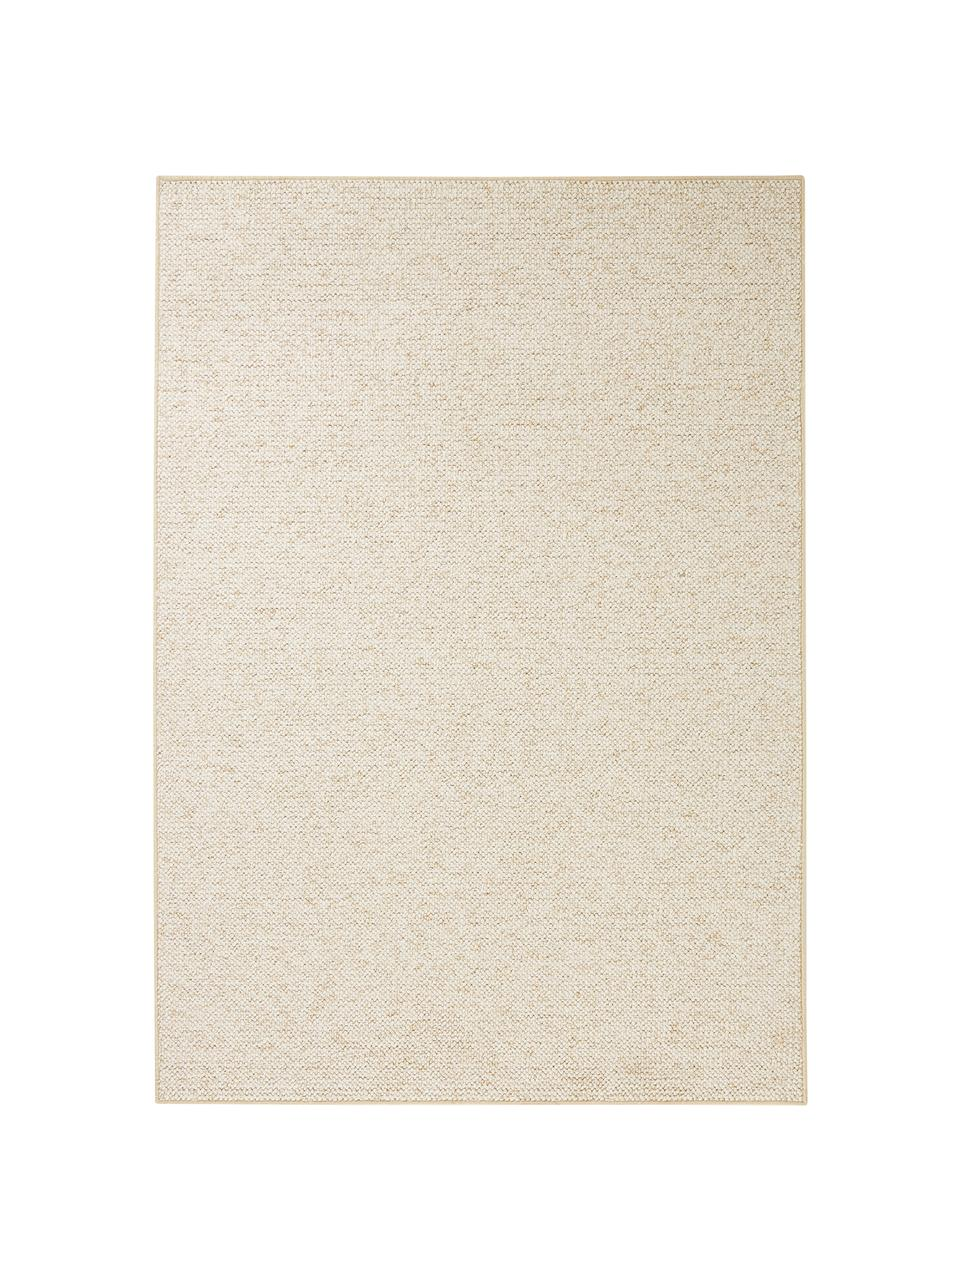 Alfombra de tejido de bolitas Lyon, Parte superior: polipropileno, Reverso: forro polar, Crema jaspeado, An 200 x L 300 cm (Tamaño L)